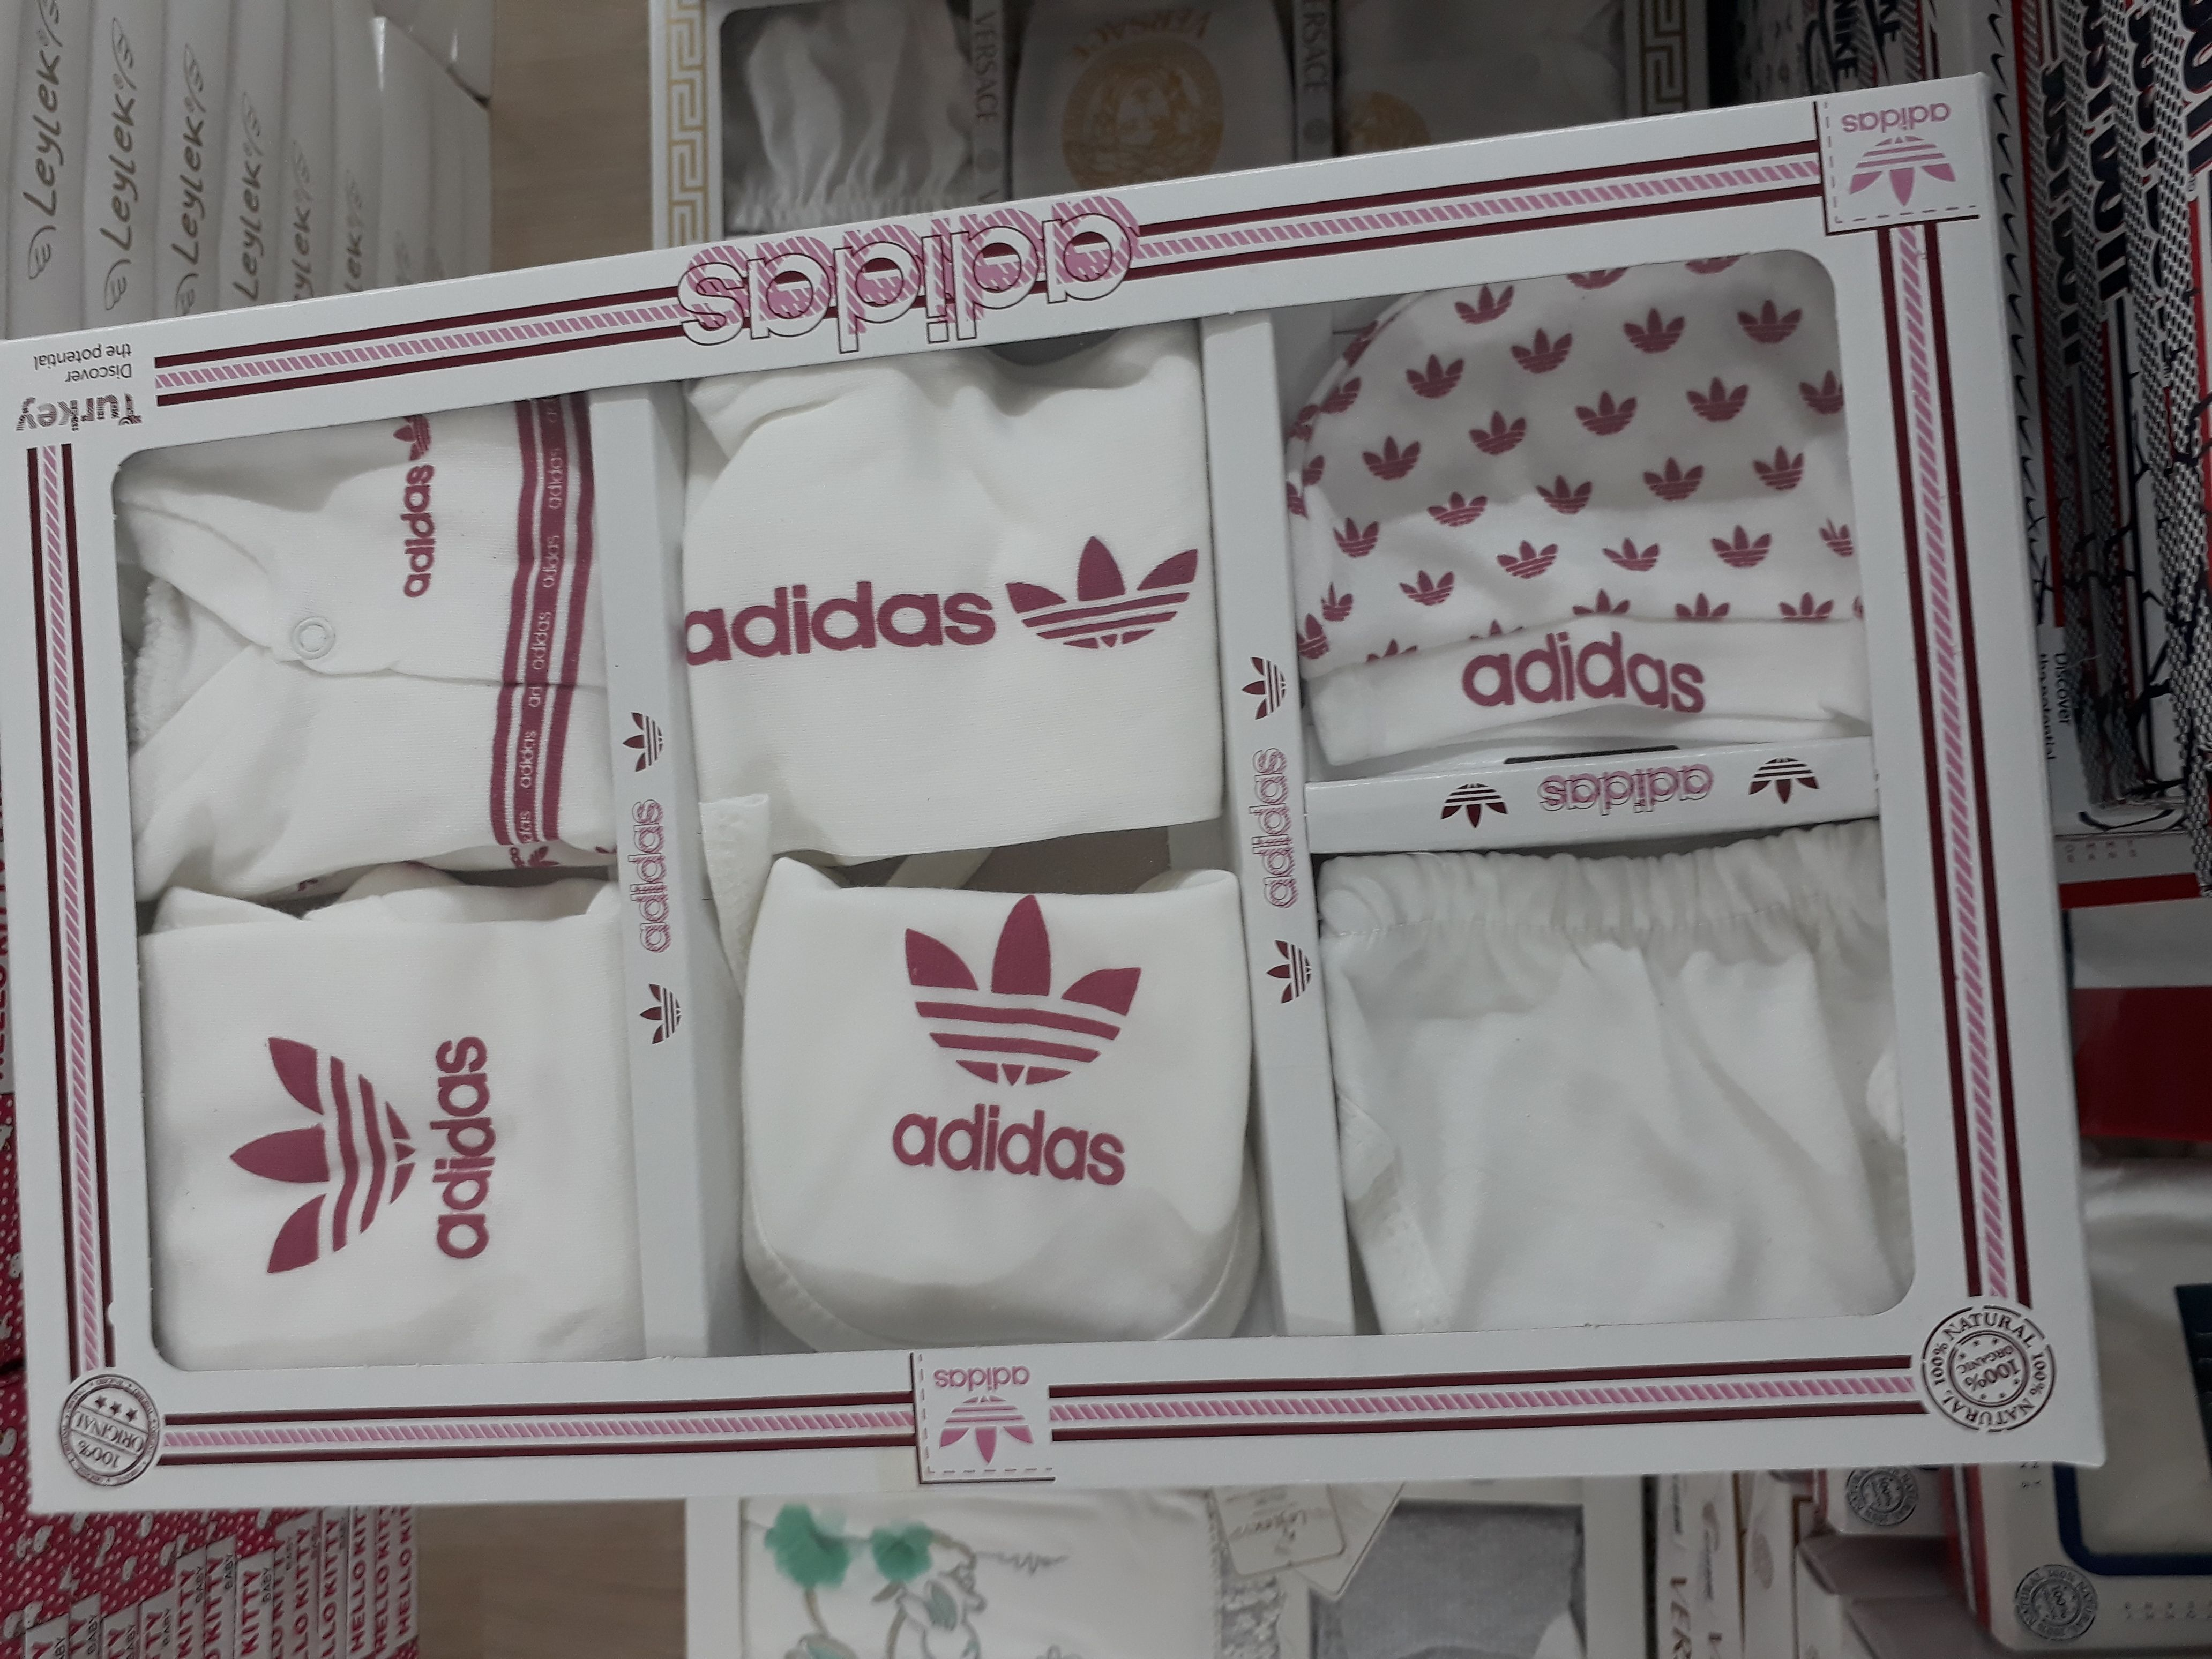 Disciplina ex heroico  adidas baby clothes box set wholesale | Wholesale kids clothing, Kids  wholesale, Wholesale baby clothes